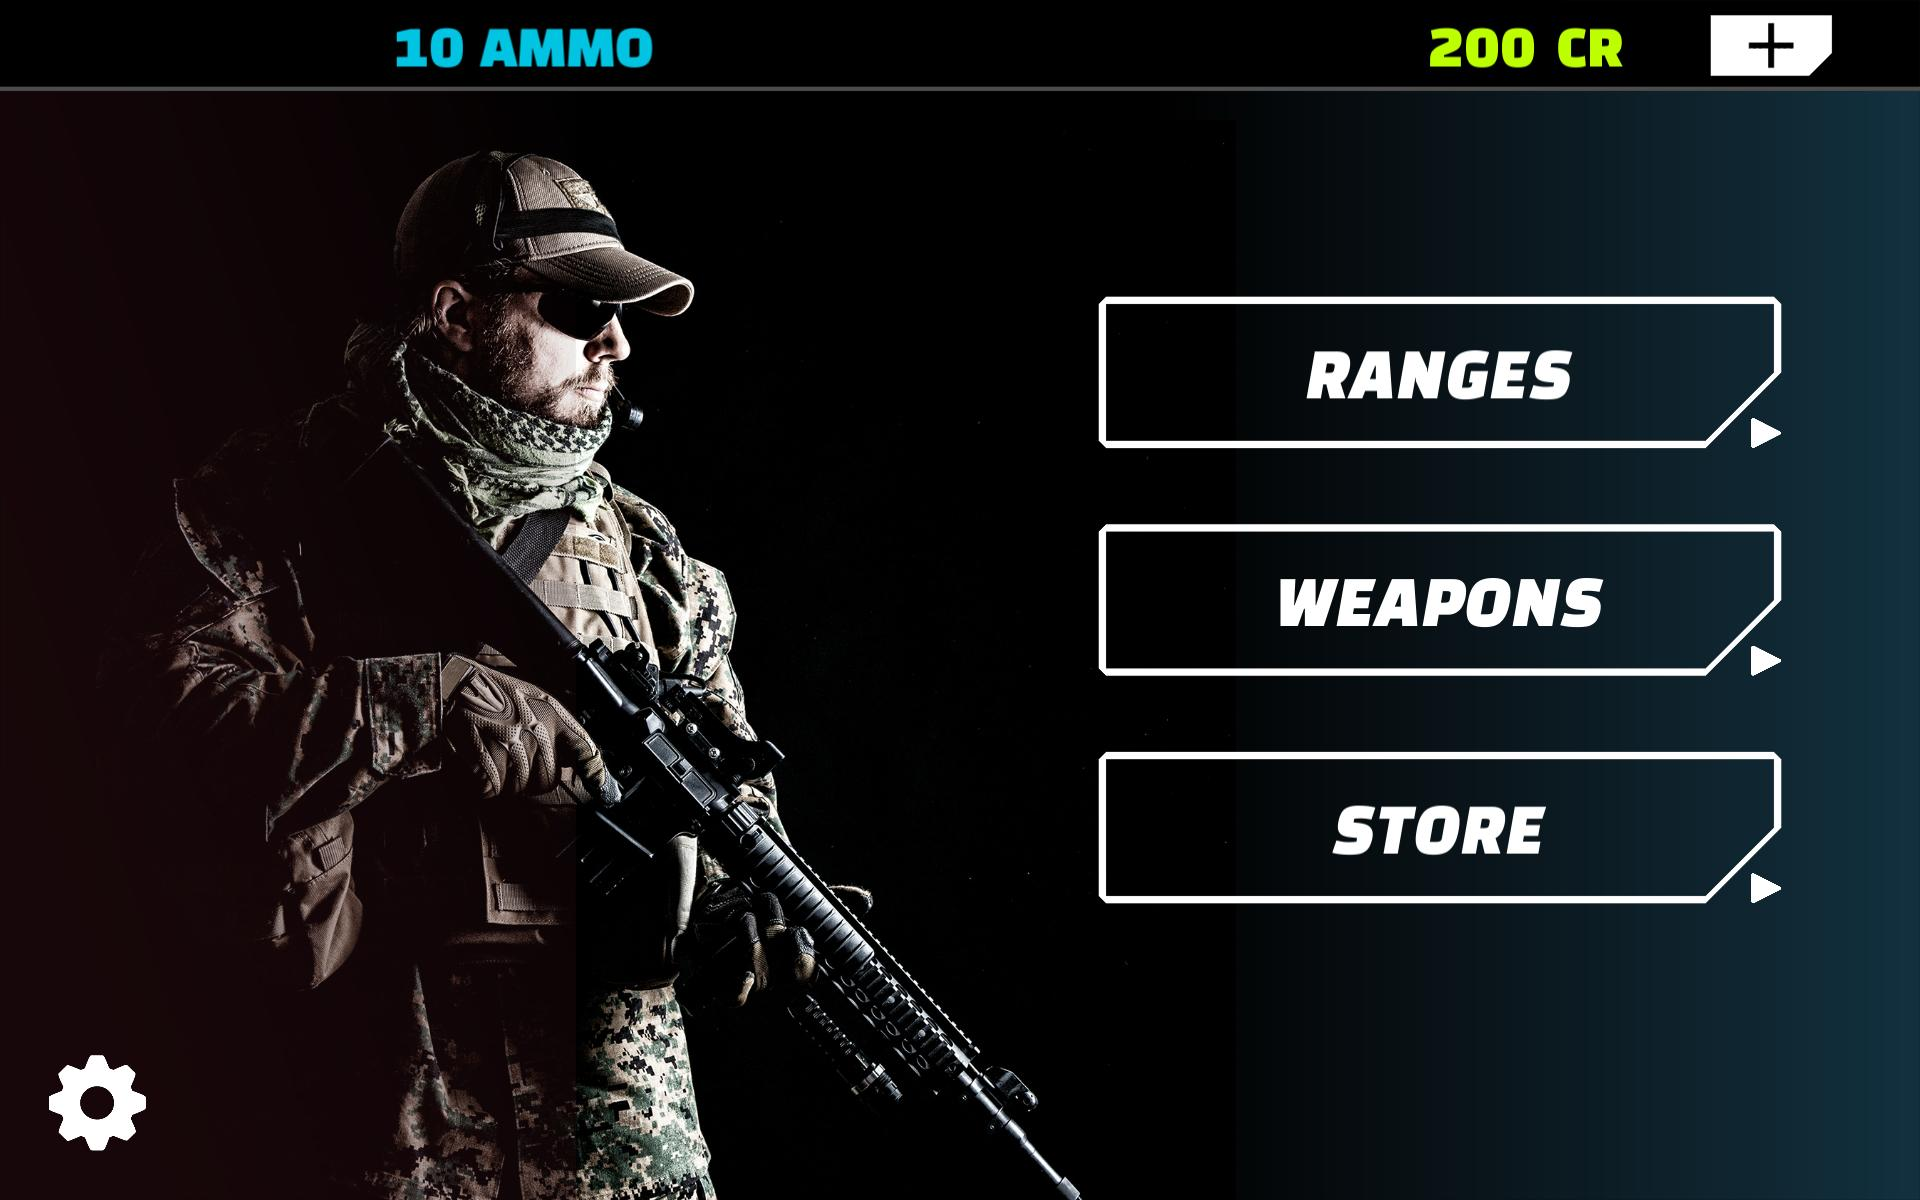 Canyon Shooting 2 - Free Shooting Range 3.0.6 Screenshot 18